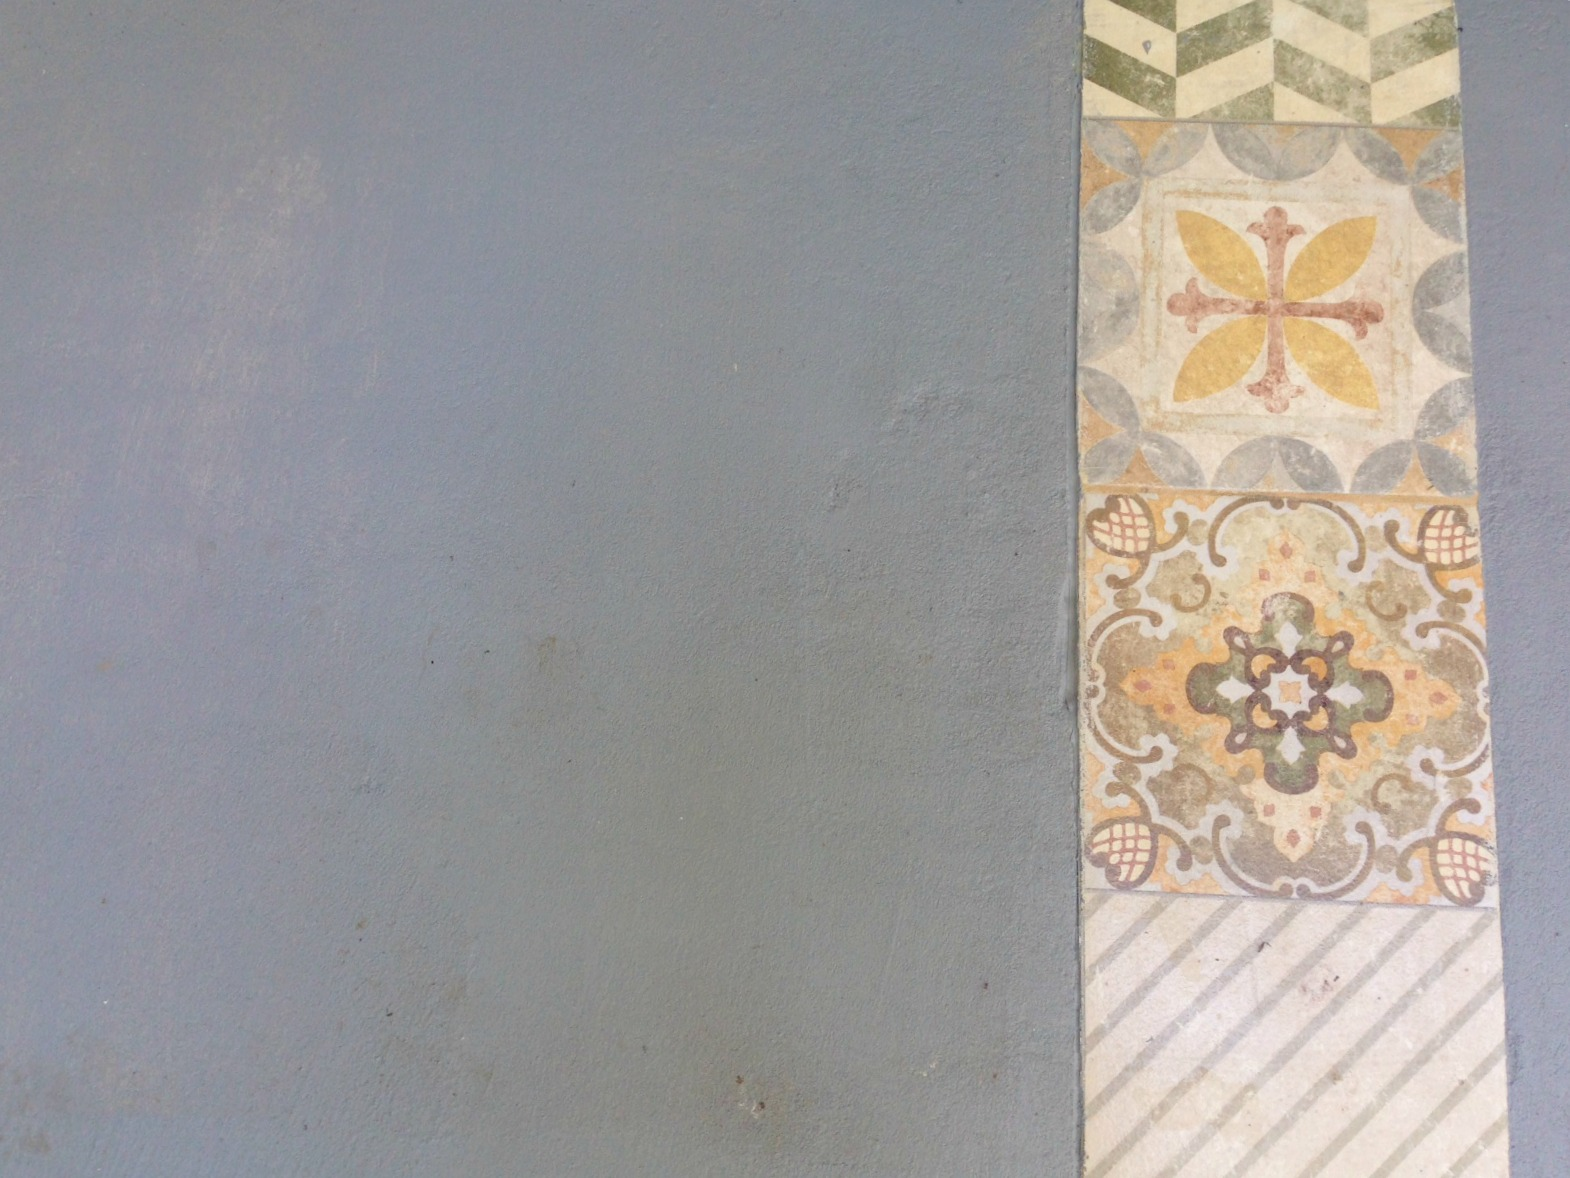 cemento alisado con piso calcareo